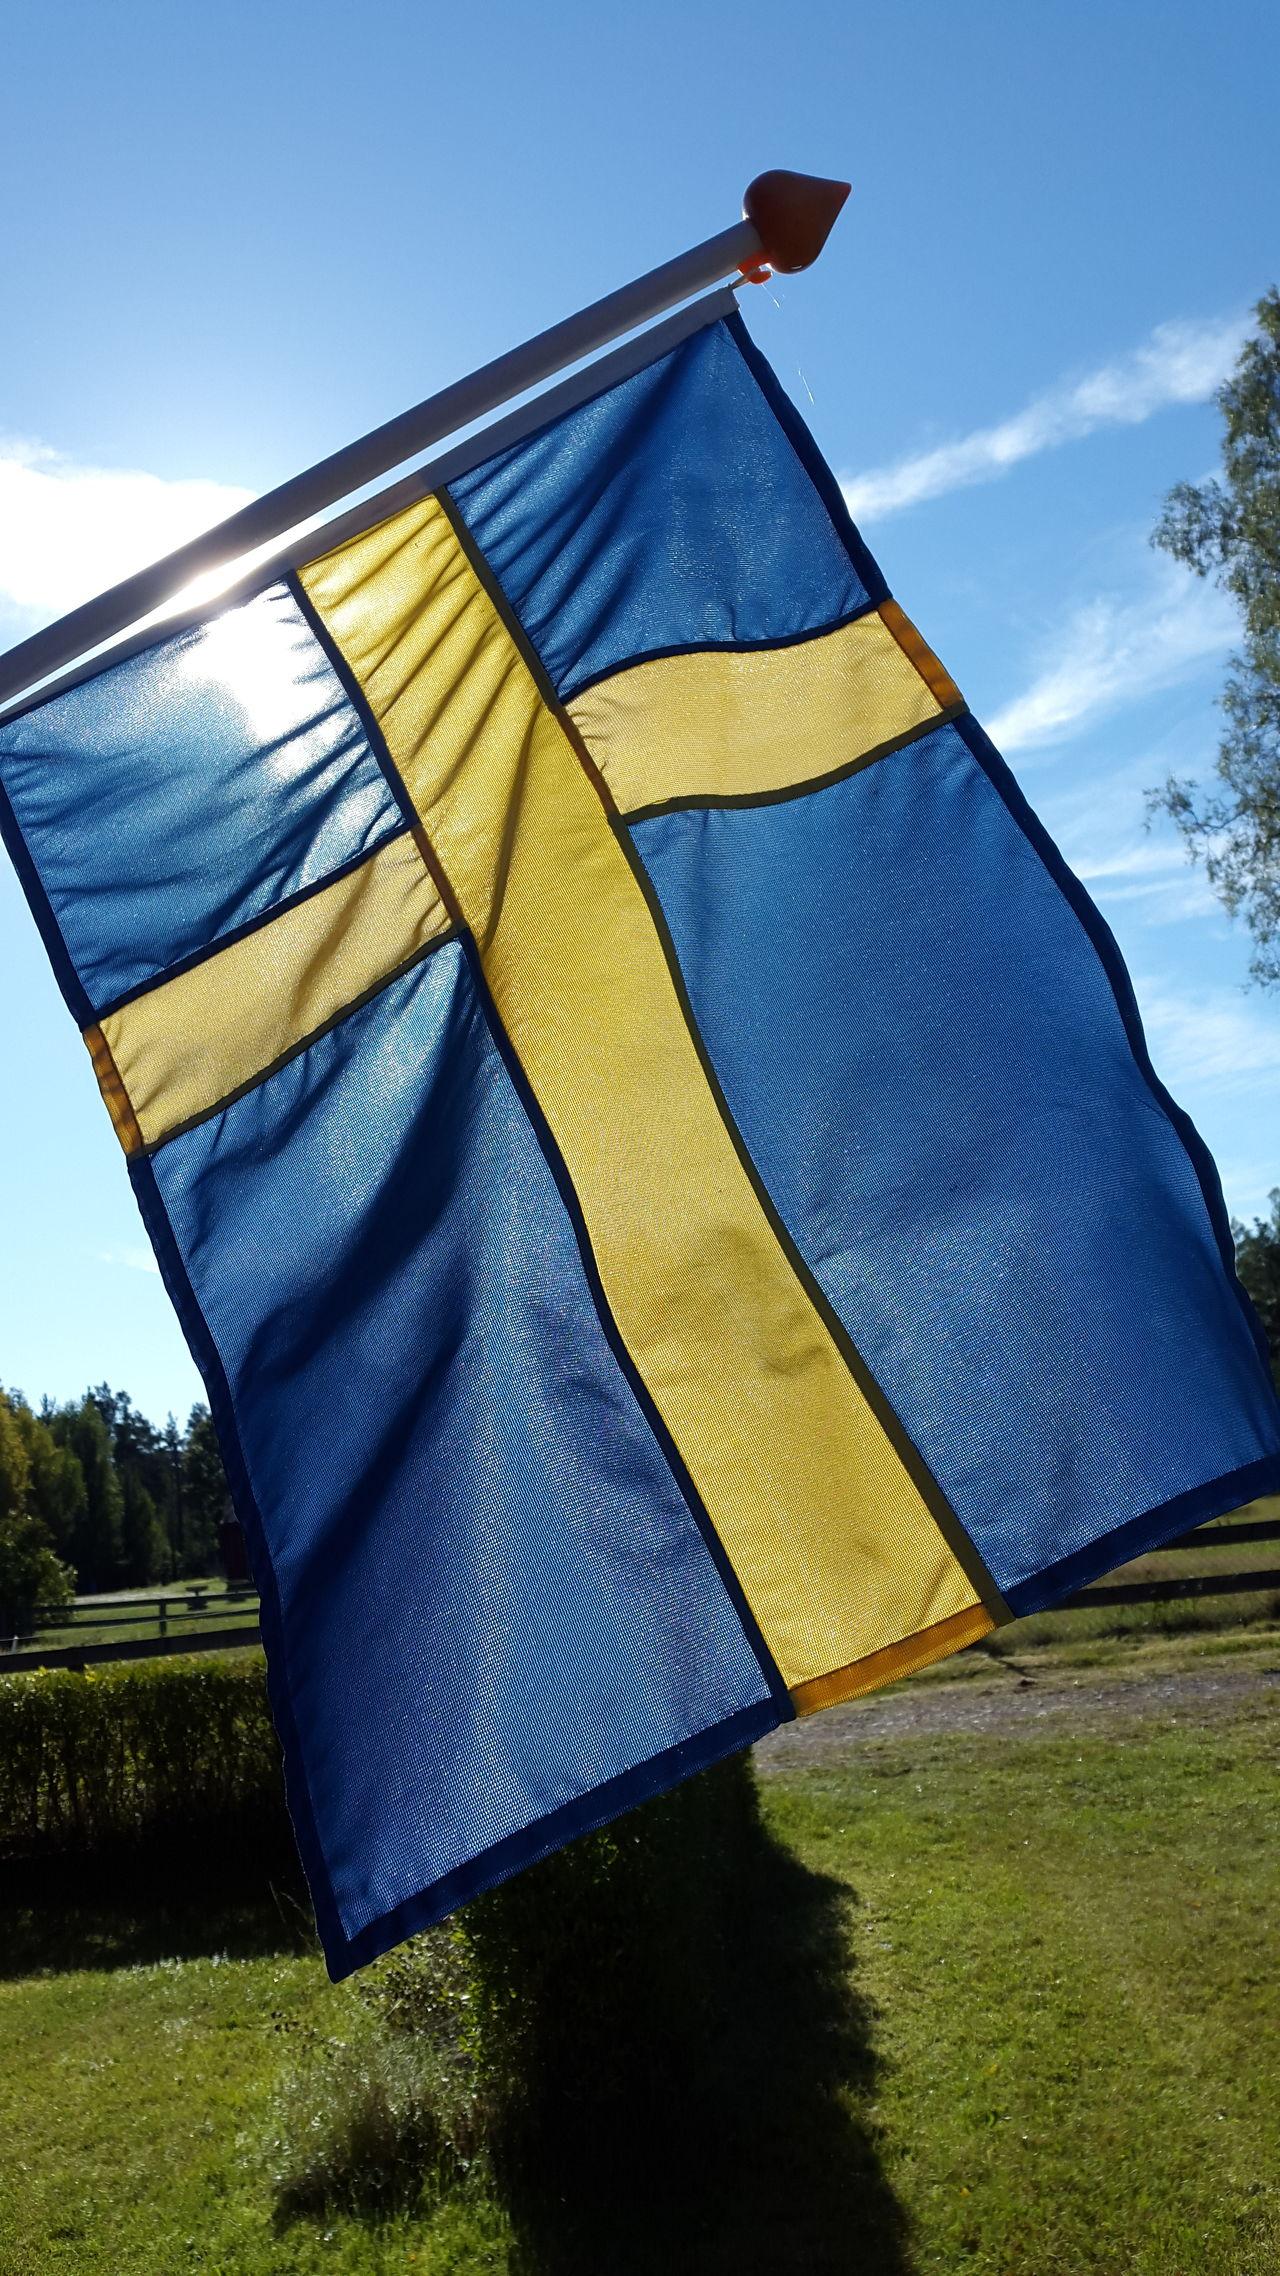 Blue Cloud Day Eriksmala Journey Marknadsvägen Multi Colored No People Outdoors Sky Sun Light Swedish Flag Tourism Yellow